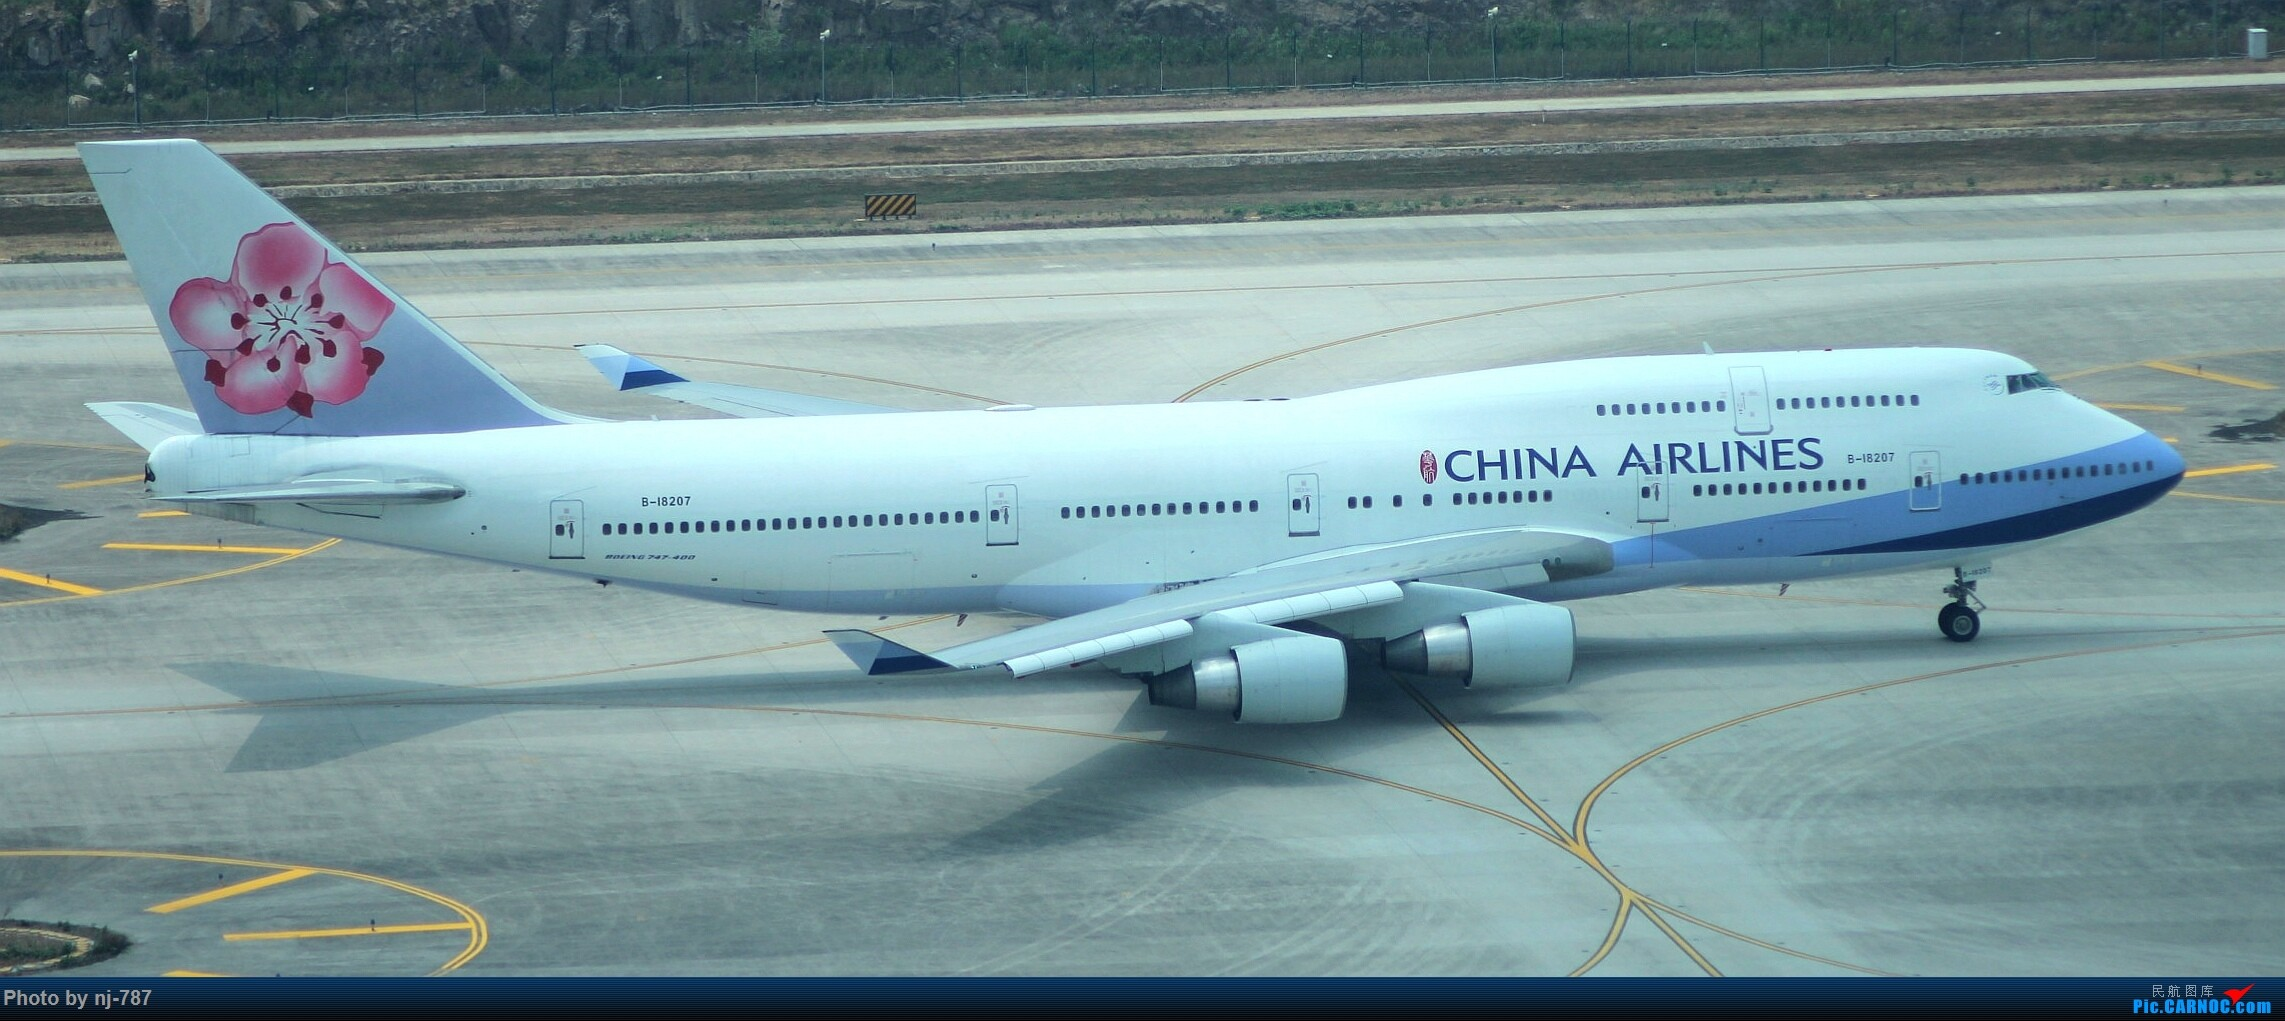 Re:[原创]站得高,看得远!NKG双跑,T2启用后初踏! BOEING 747-400 B-18207 南京禄口国际机场